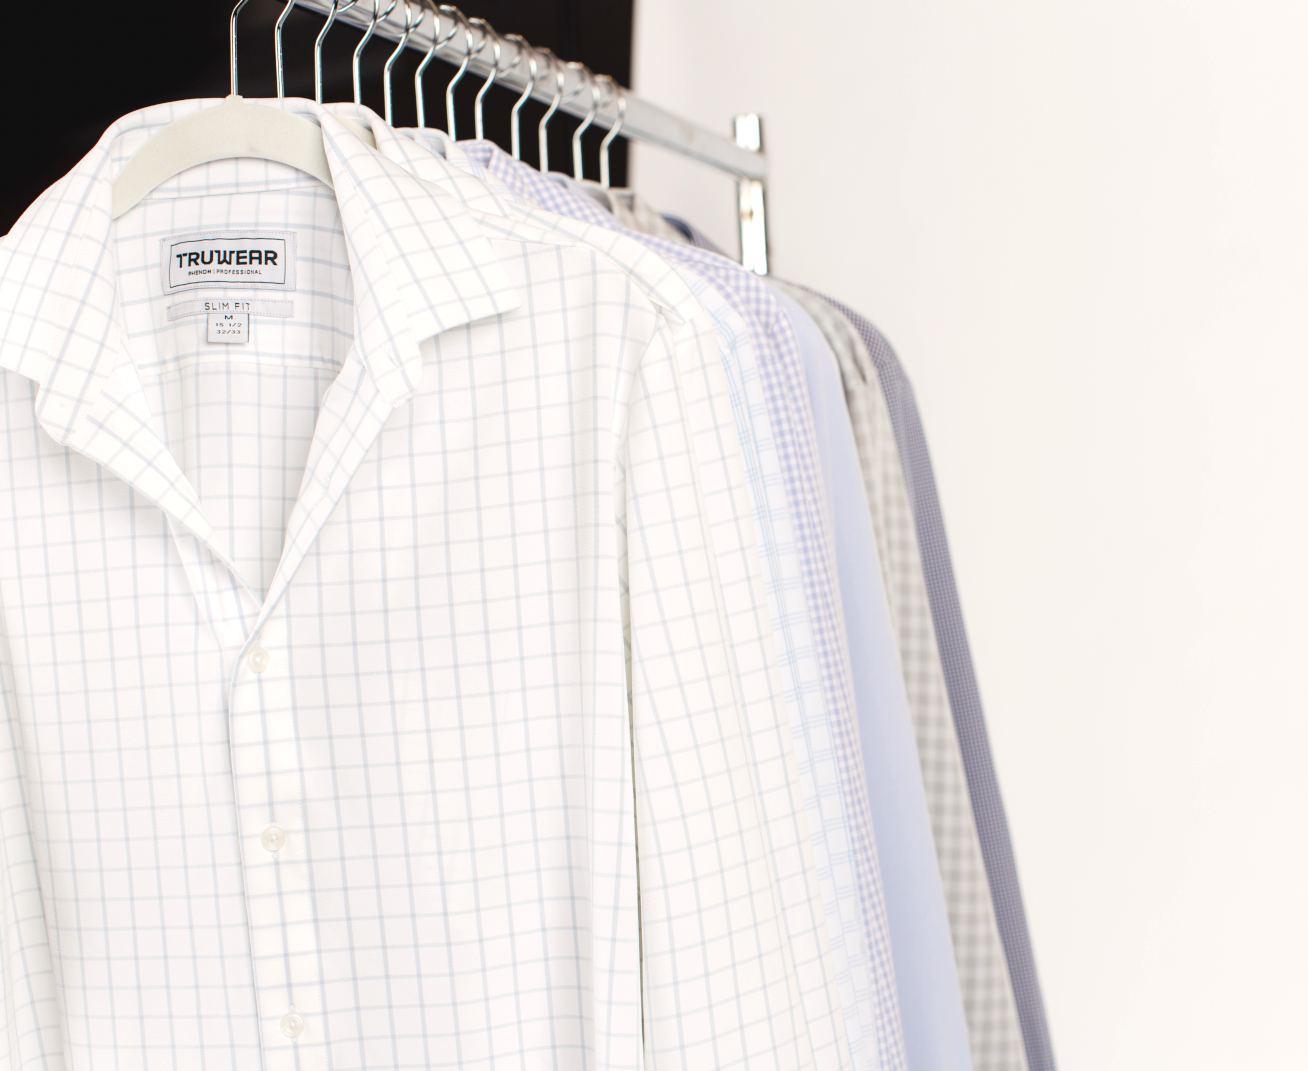 Truwear Phenom Professional Patterned Dress Shirts